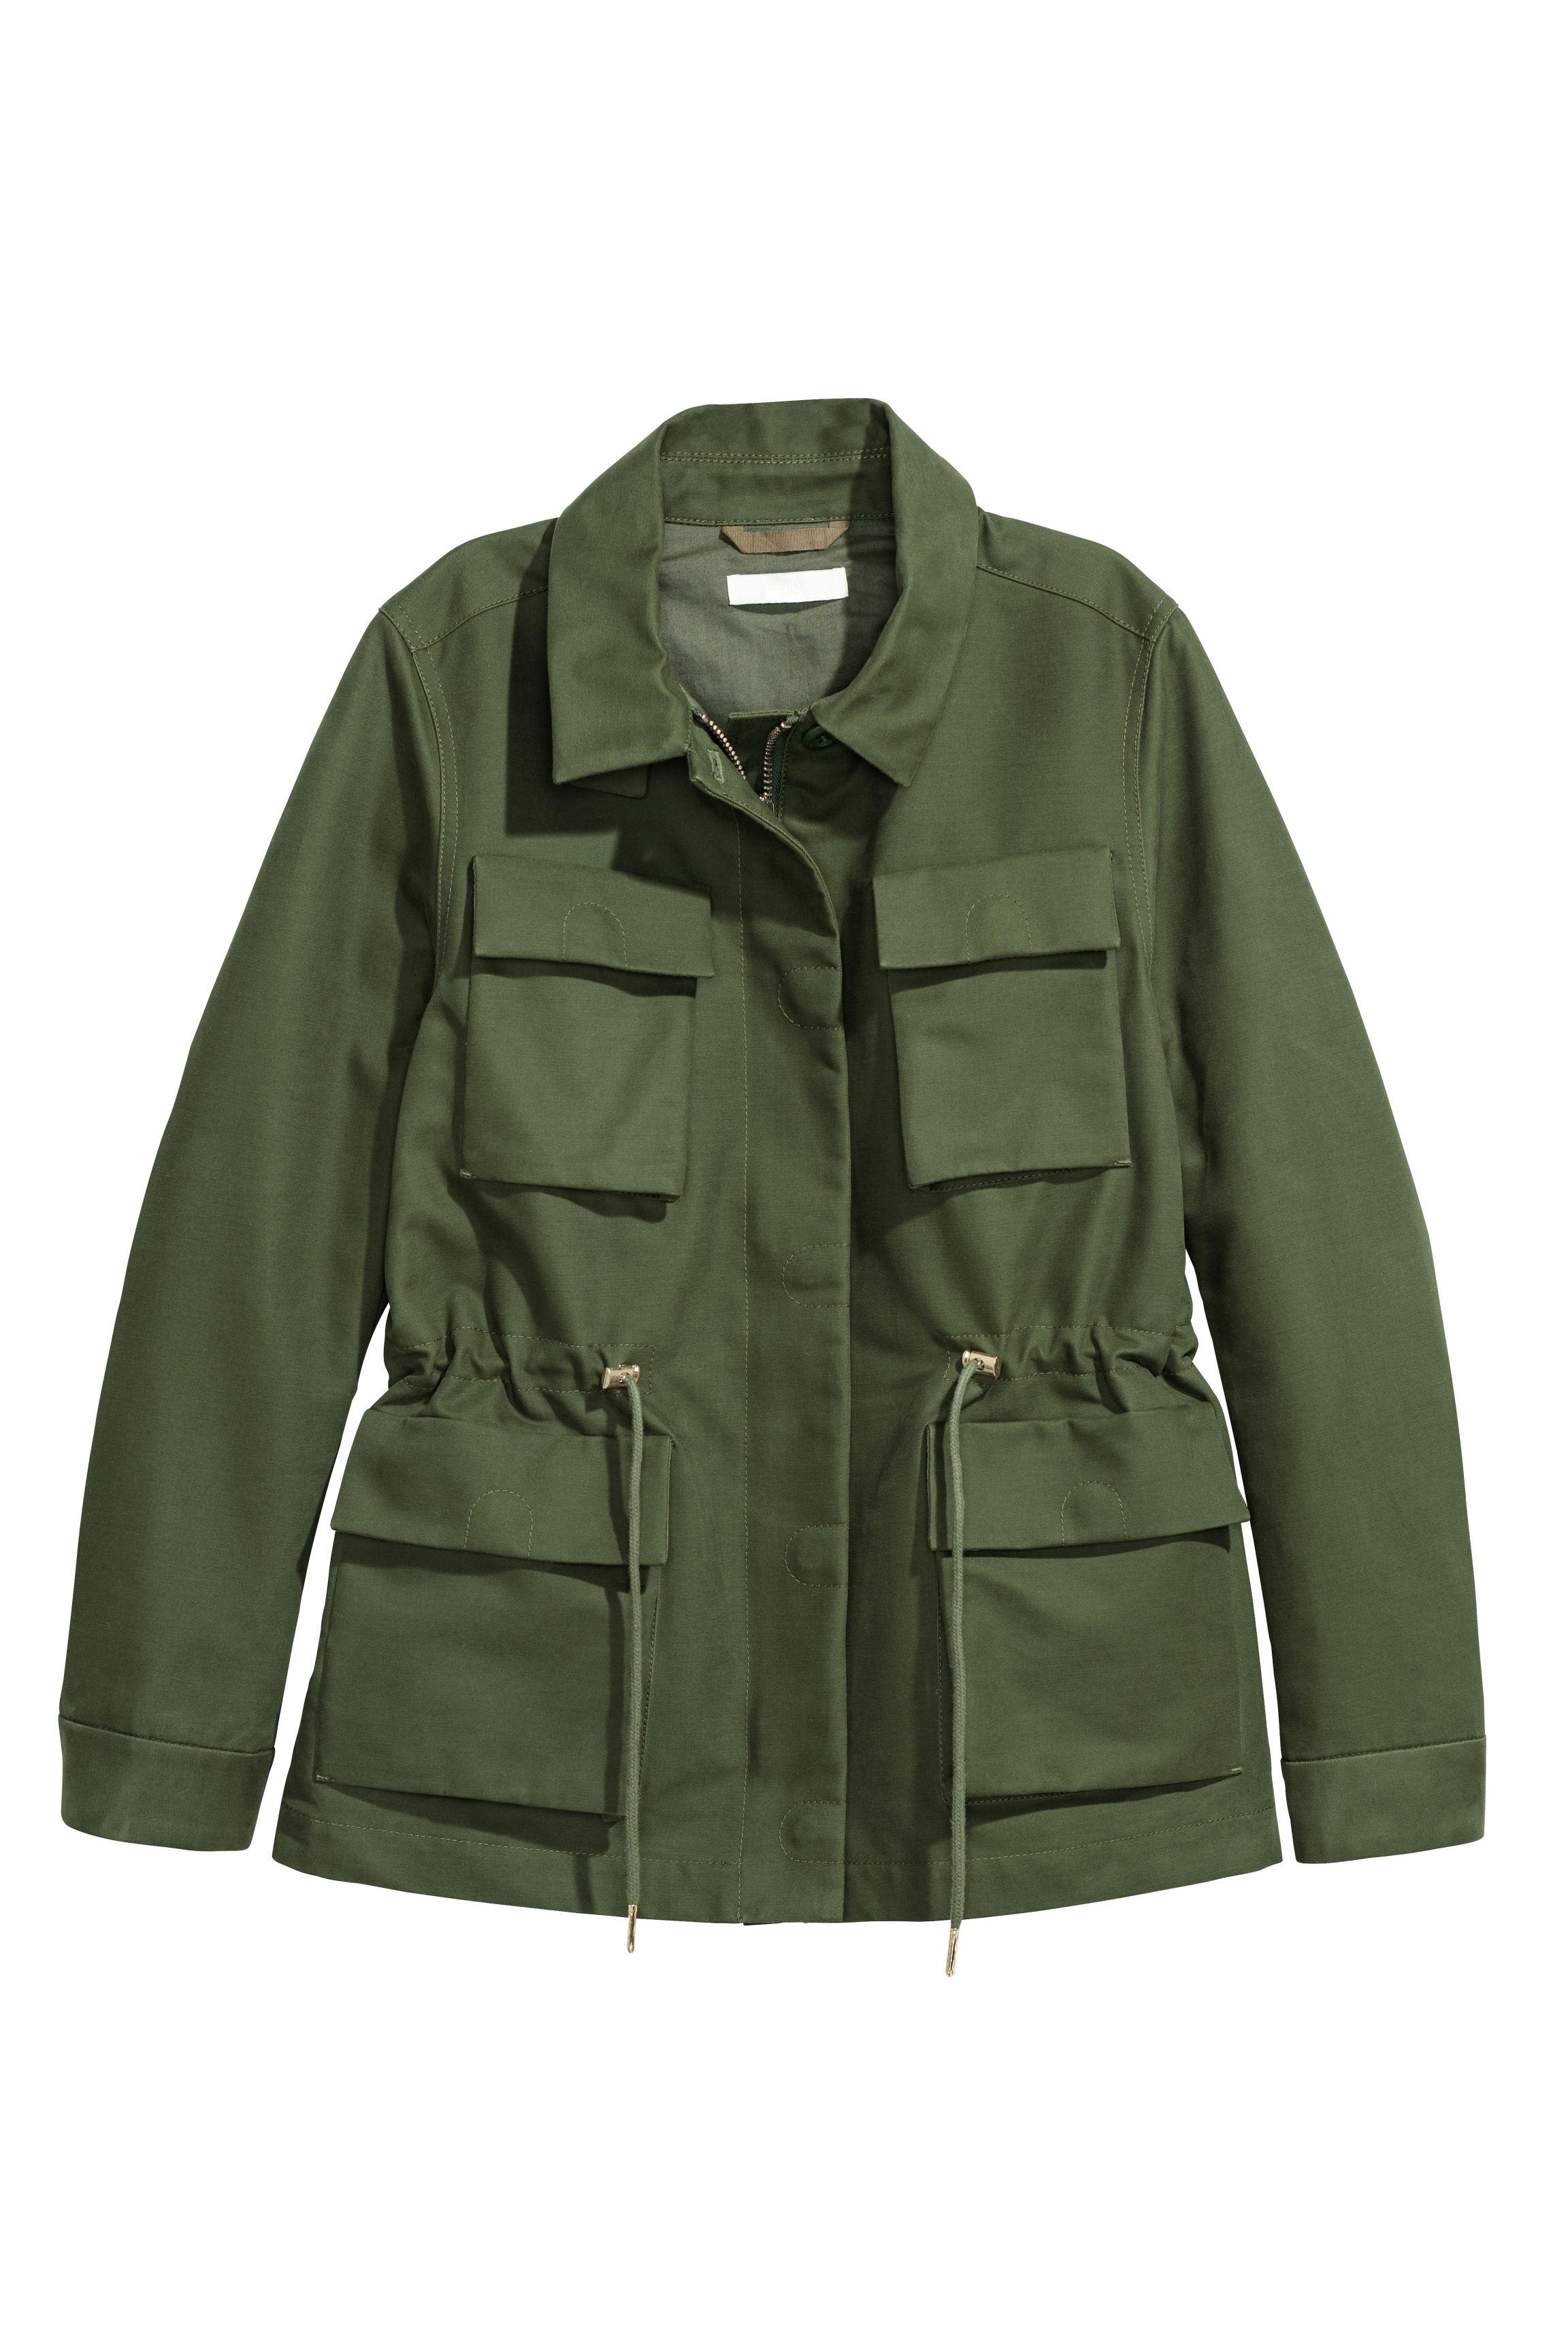 Cotton Cargo Jacket - Green - Ladies | H&M US